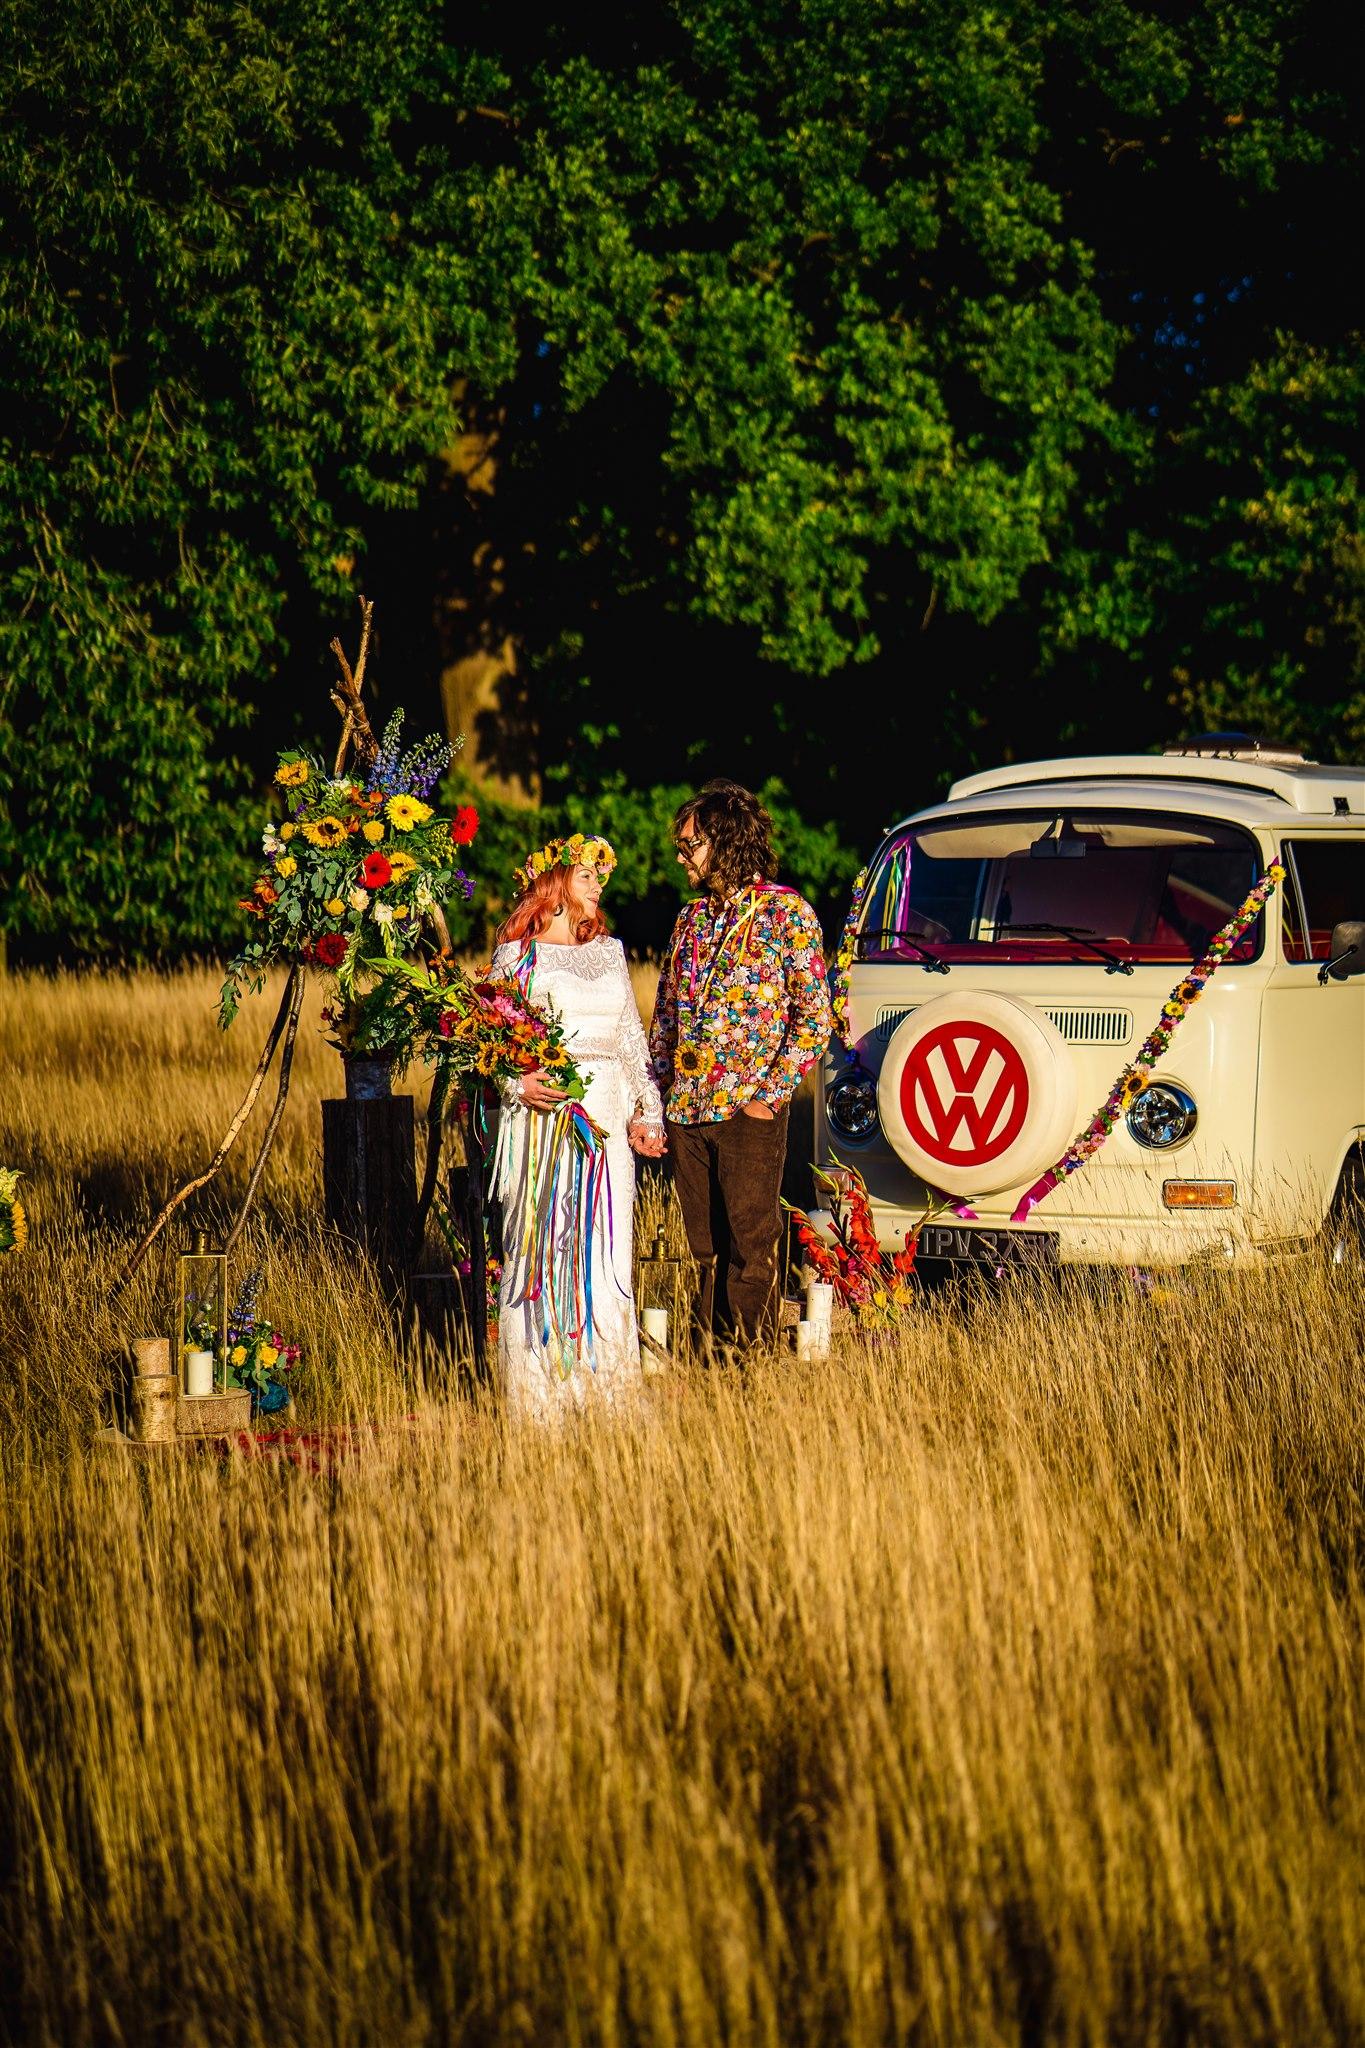 colourful bohemian wedding - 70s wedding - campervan wedding - hippie wedding - outdoor elopement - unconventional wedding